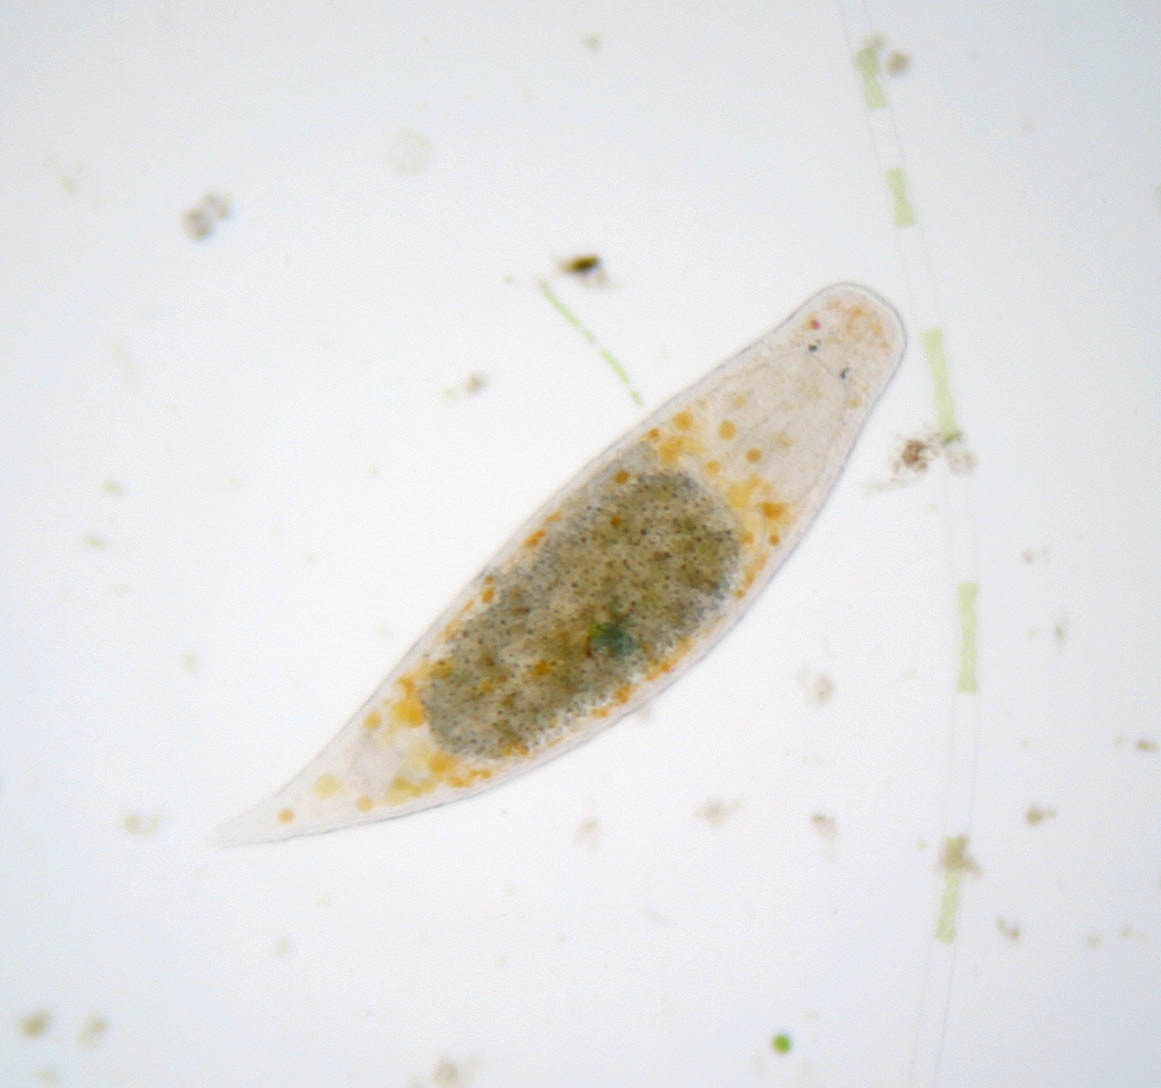 Image of Macrostomum